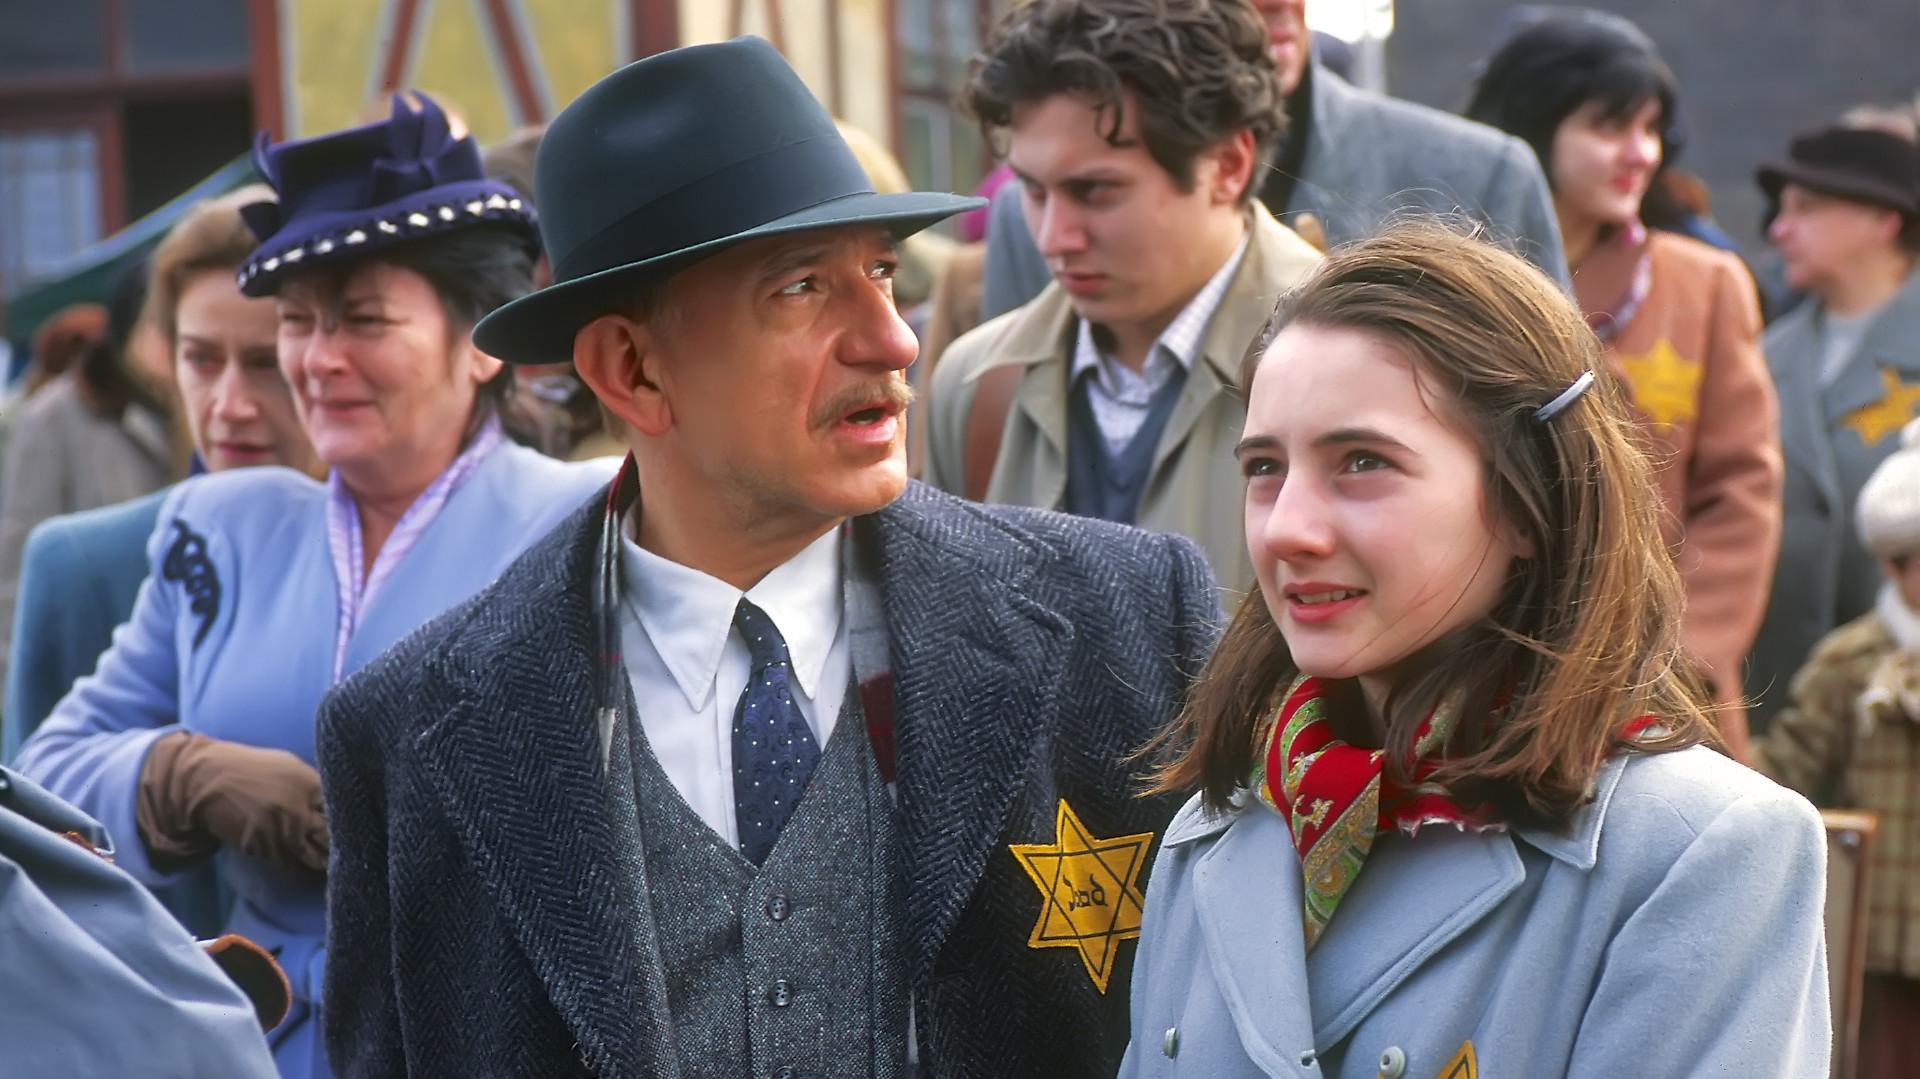 Anne-Frank-22.jpg